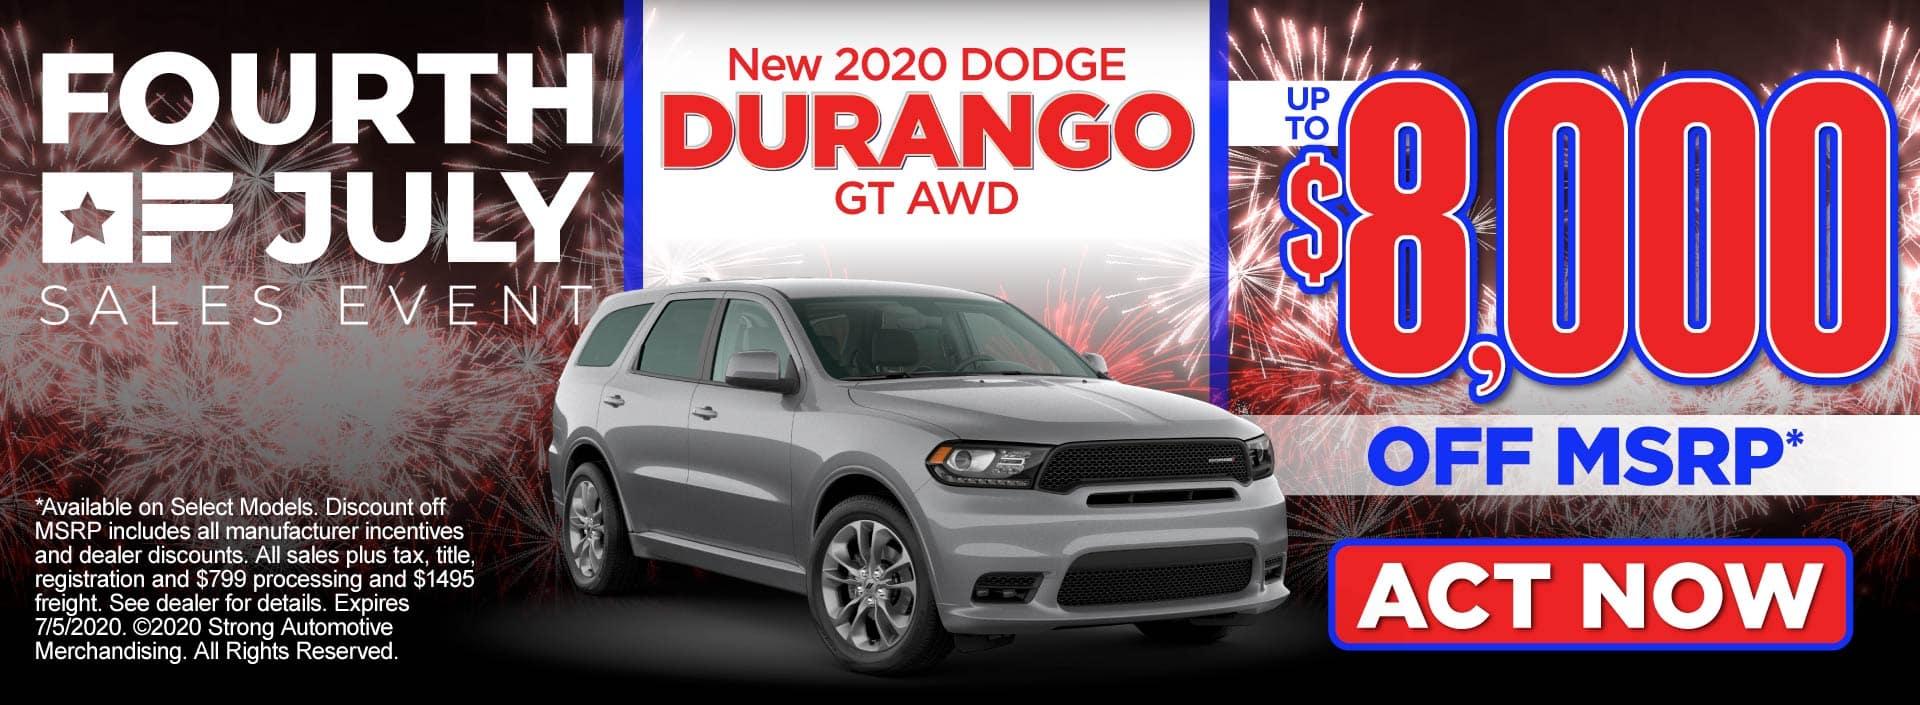 New 2020 Dodge Durango – up to $8,000 off MSRP* – Act Now